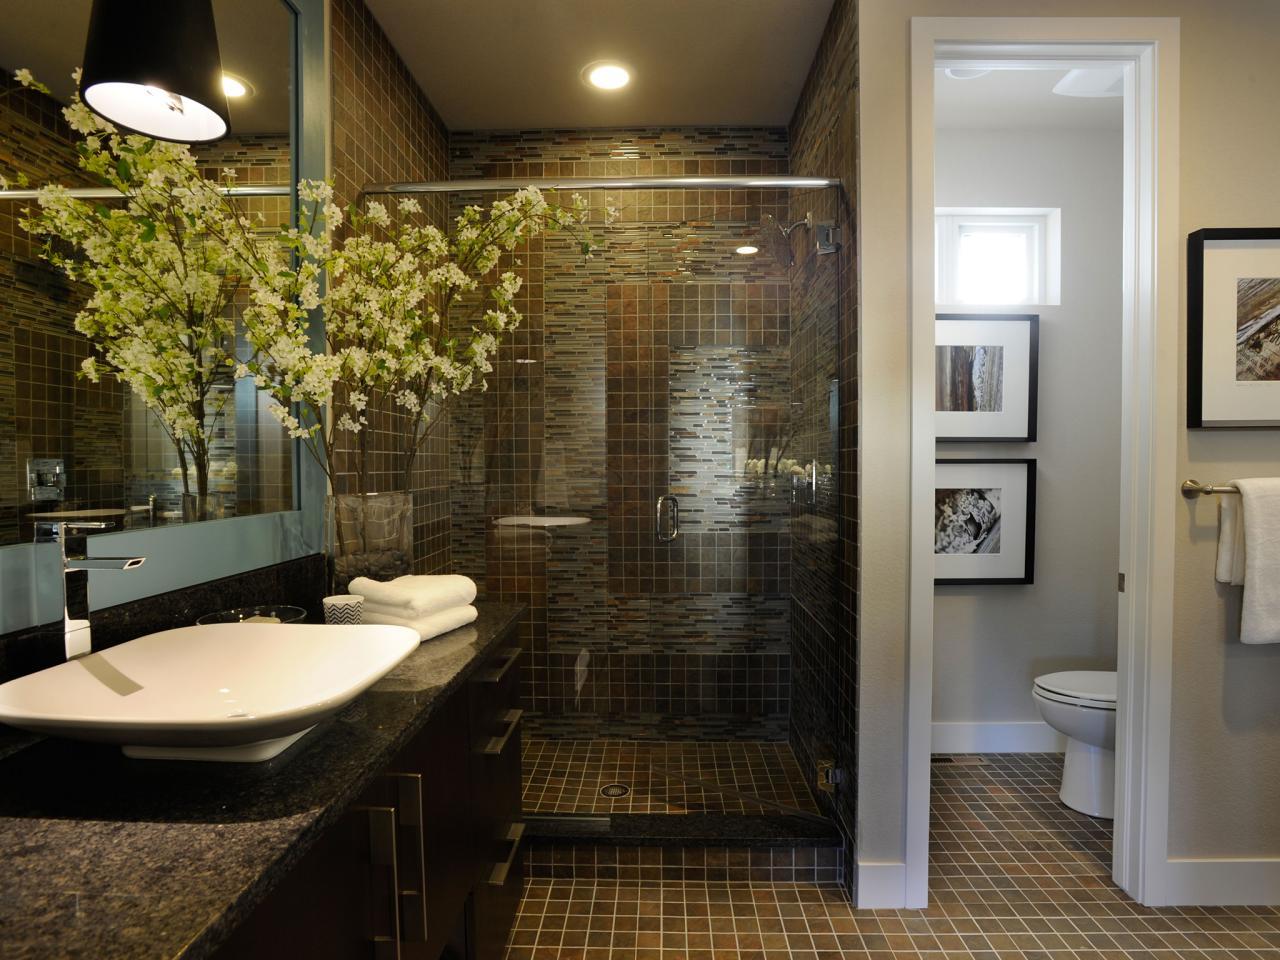 Best Kitchen Gallery: Upgrade Your Bathroom To A Home Spa Minnesota Rusco of Home Spa Bathroom on rachelxblog.com